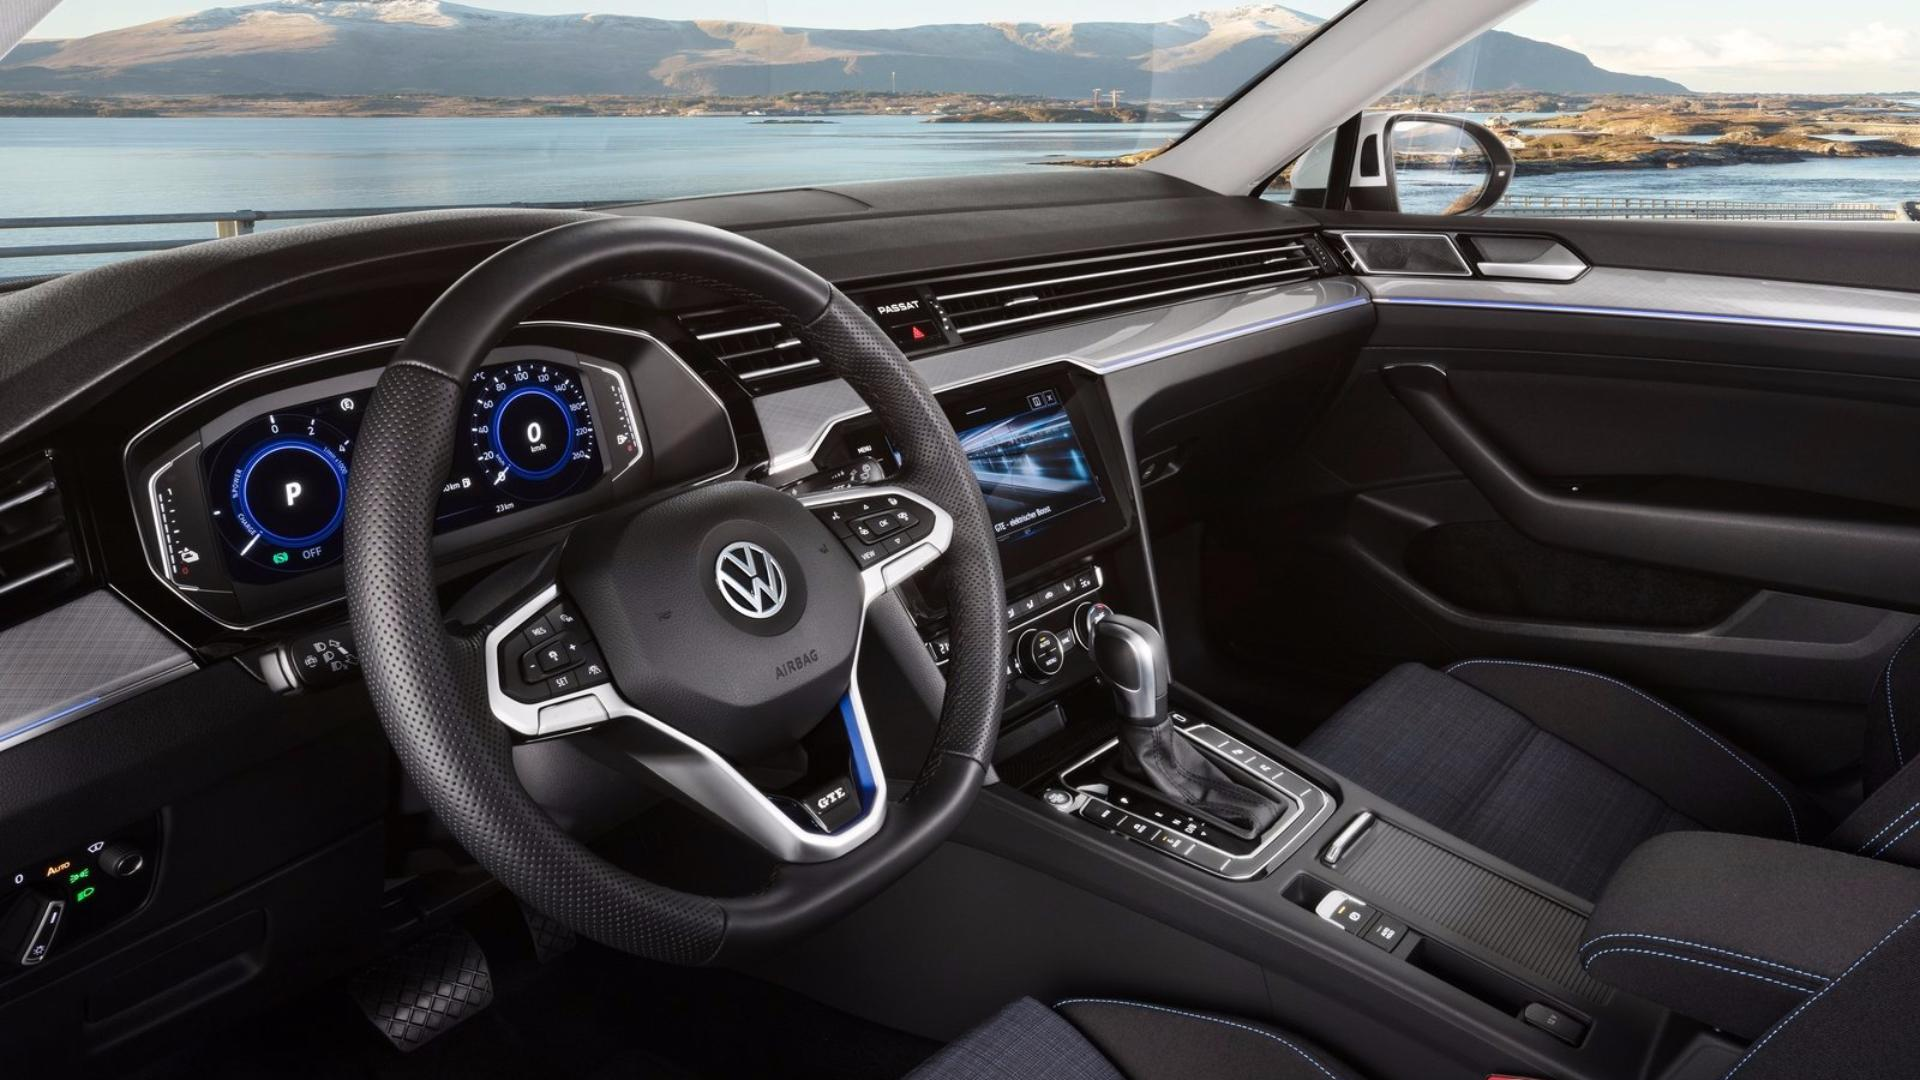 VW Passat GTE (Variant) interiér